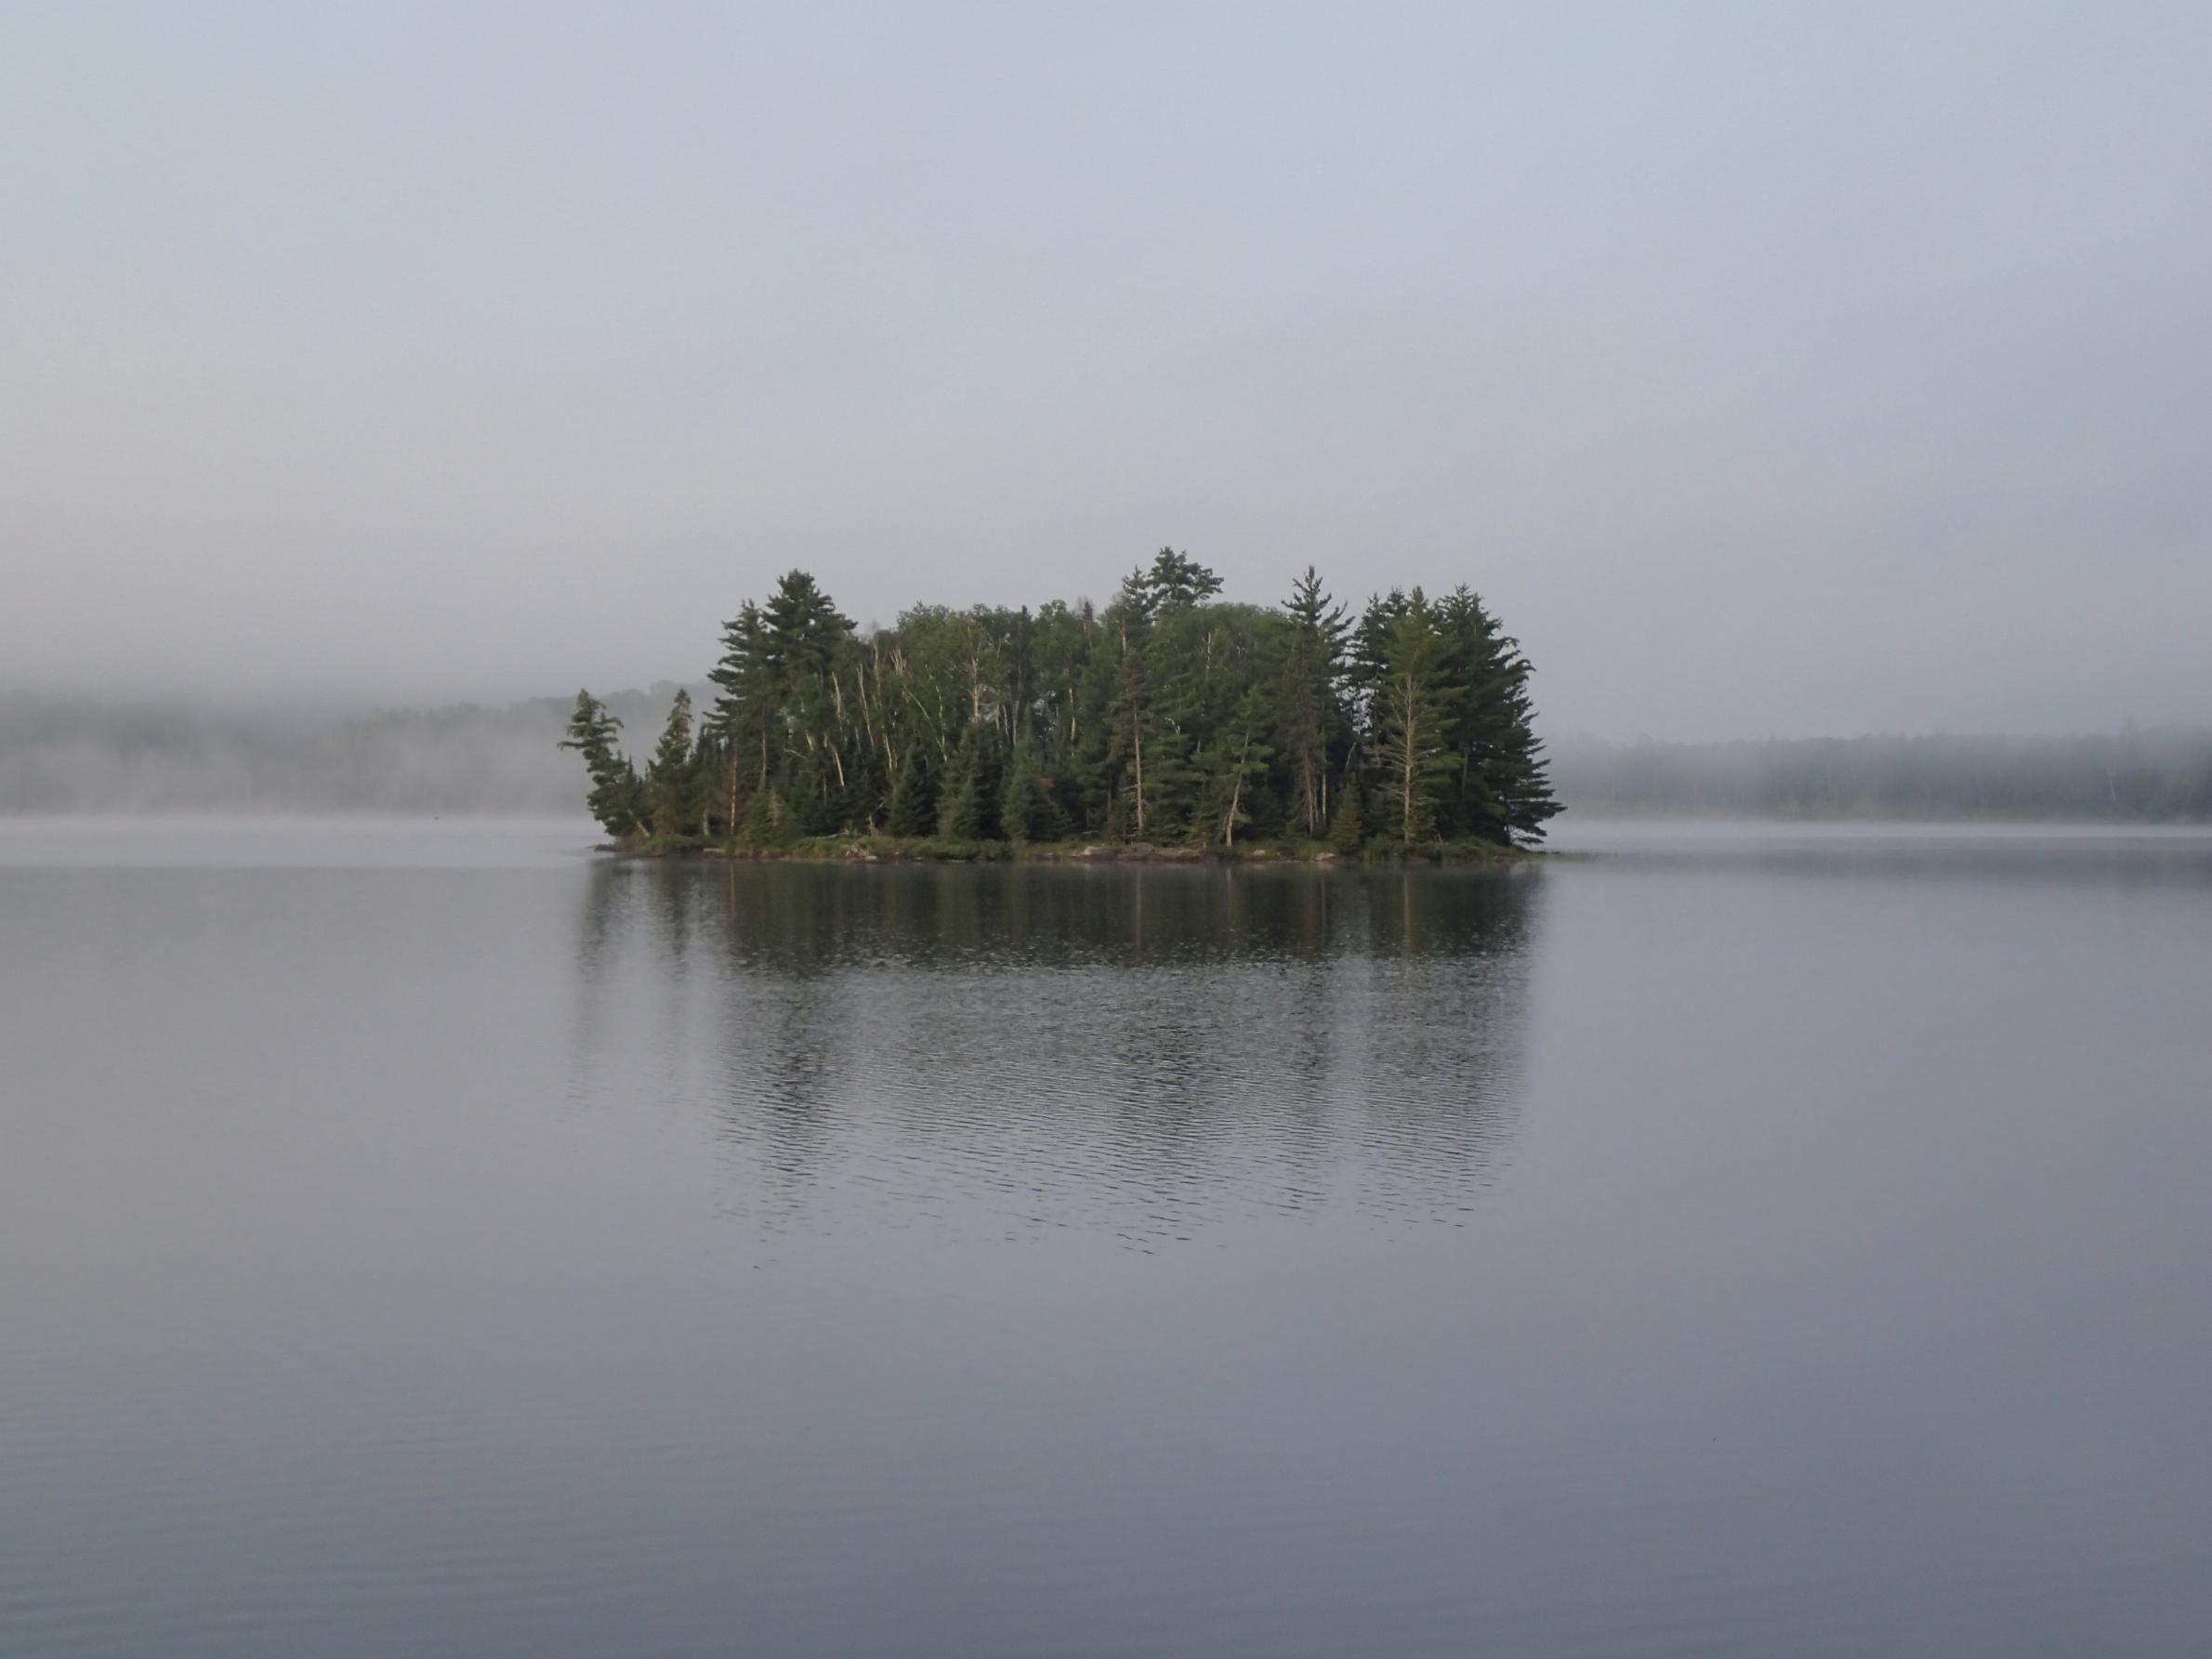 Shell Lake Island